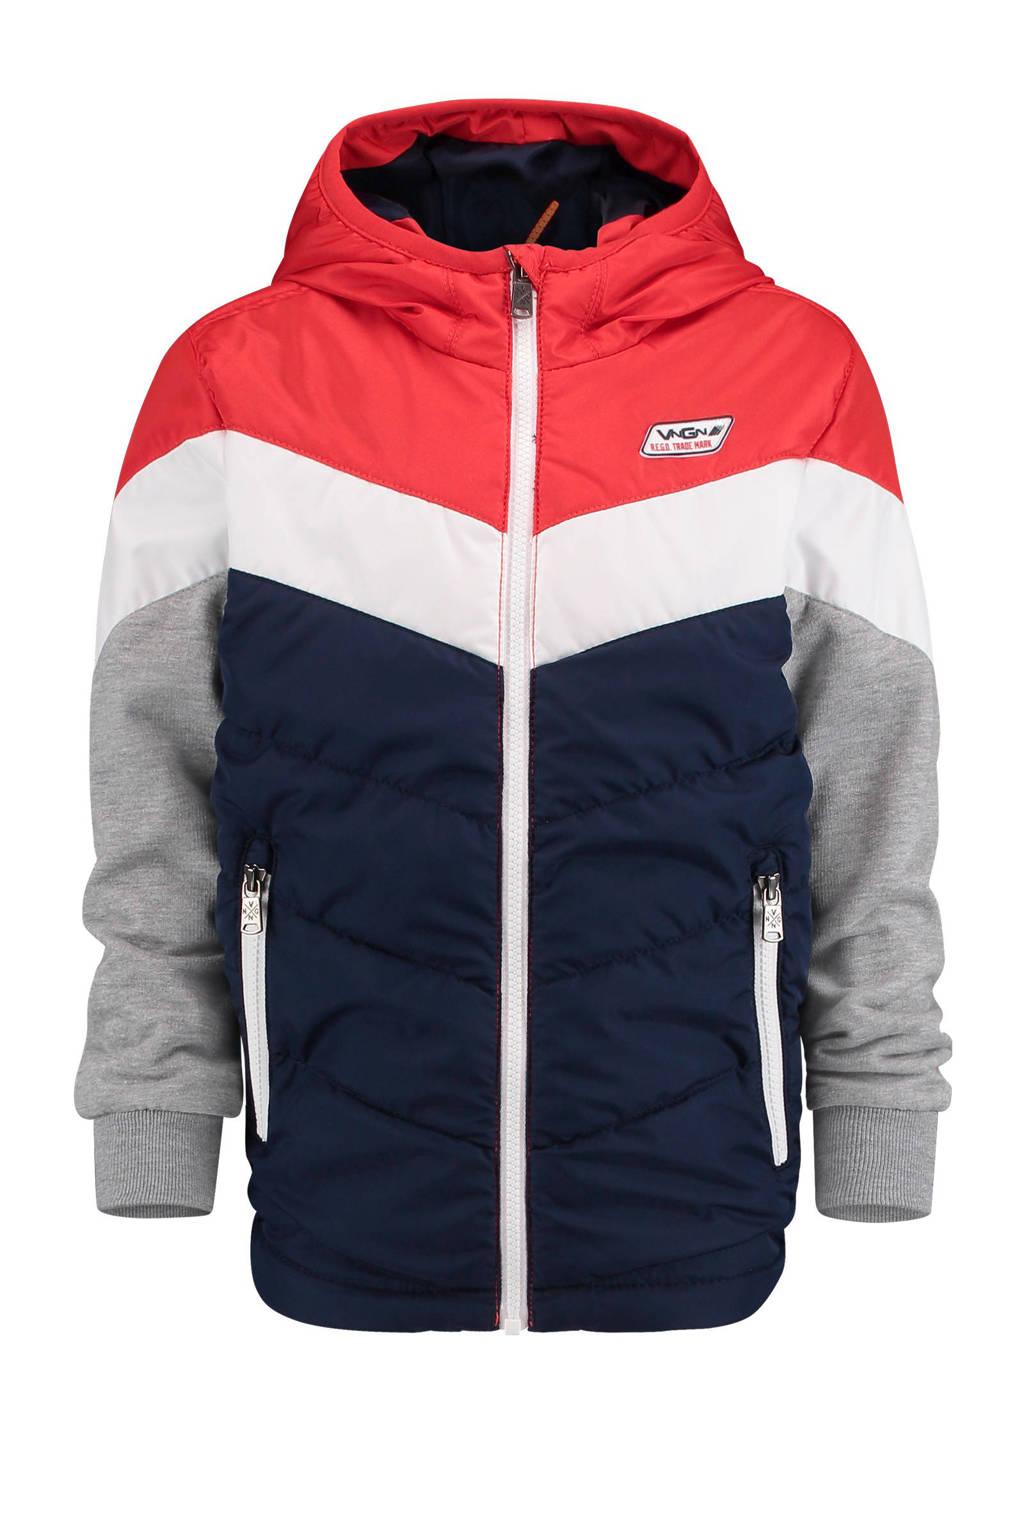 Vingino zomerjas Tamsir rood, Rood/wit/donkerblauw